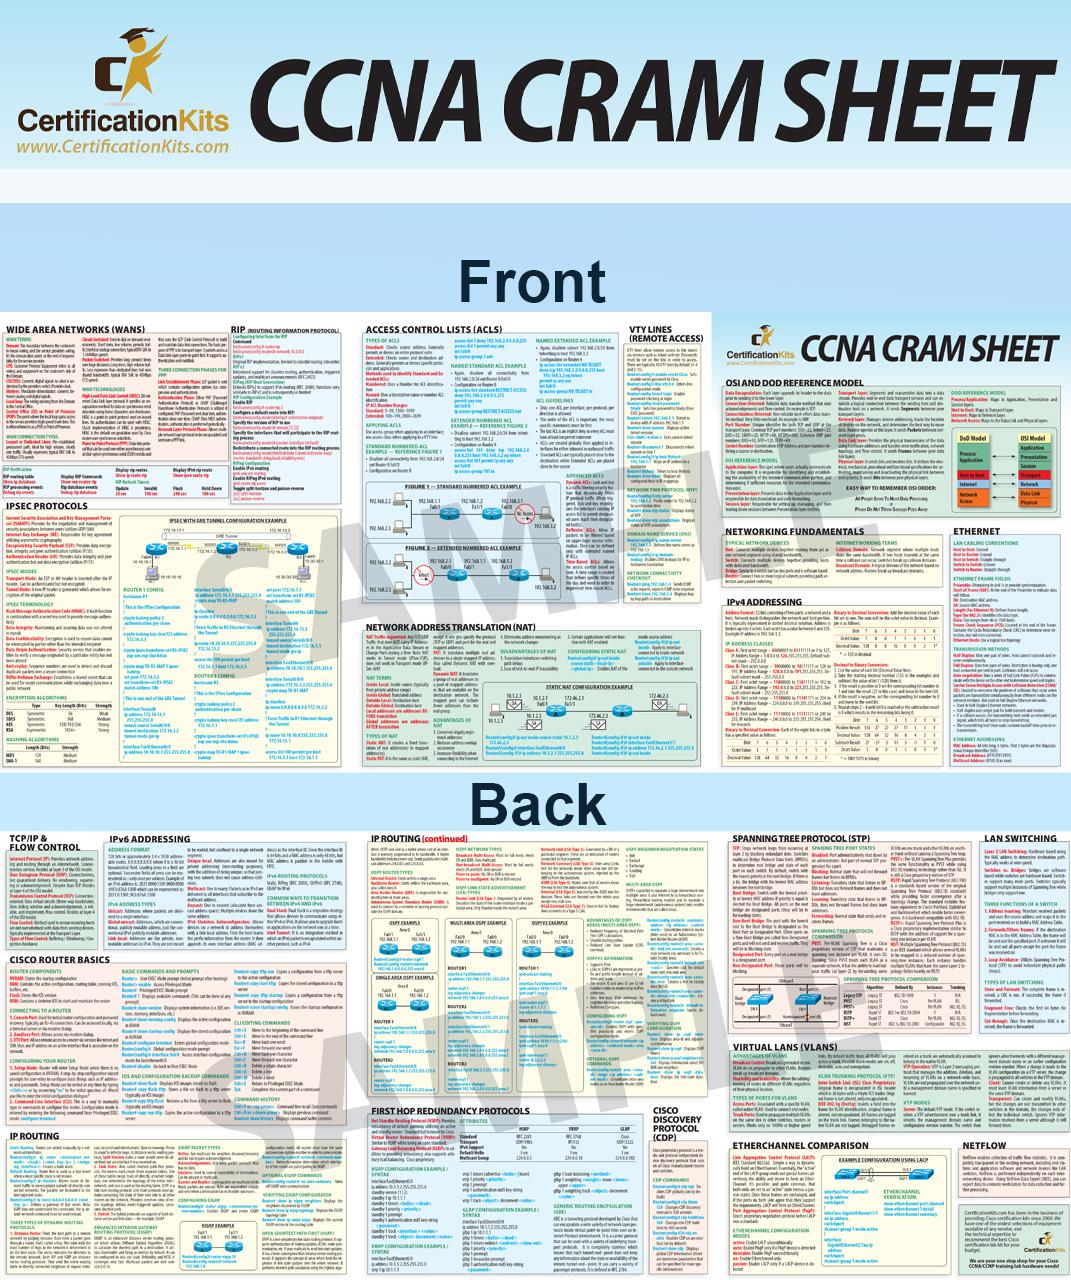 cram-v3.jpg